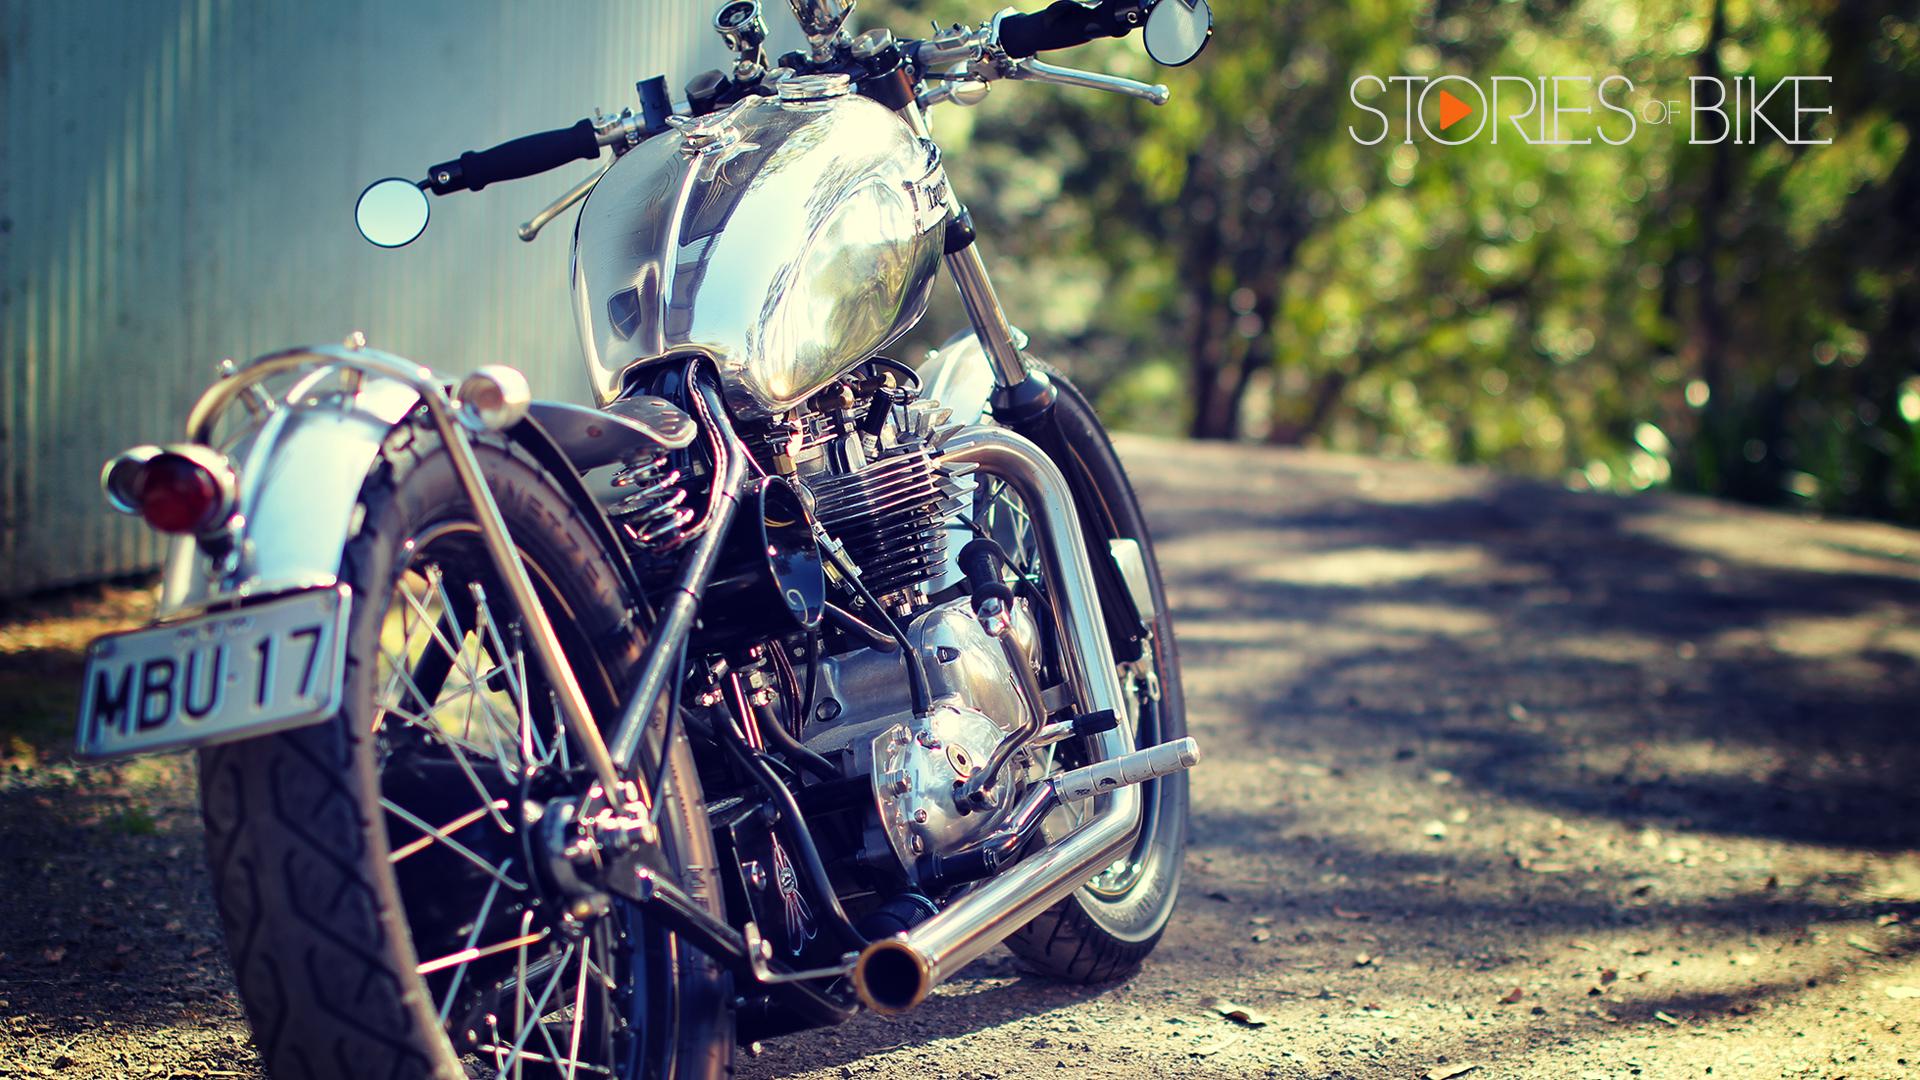 Stories_of_Bike_Publicity_Ep7_10.jpg